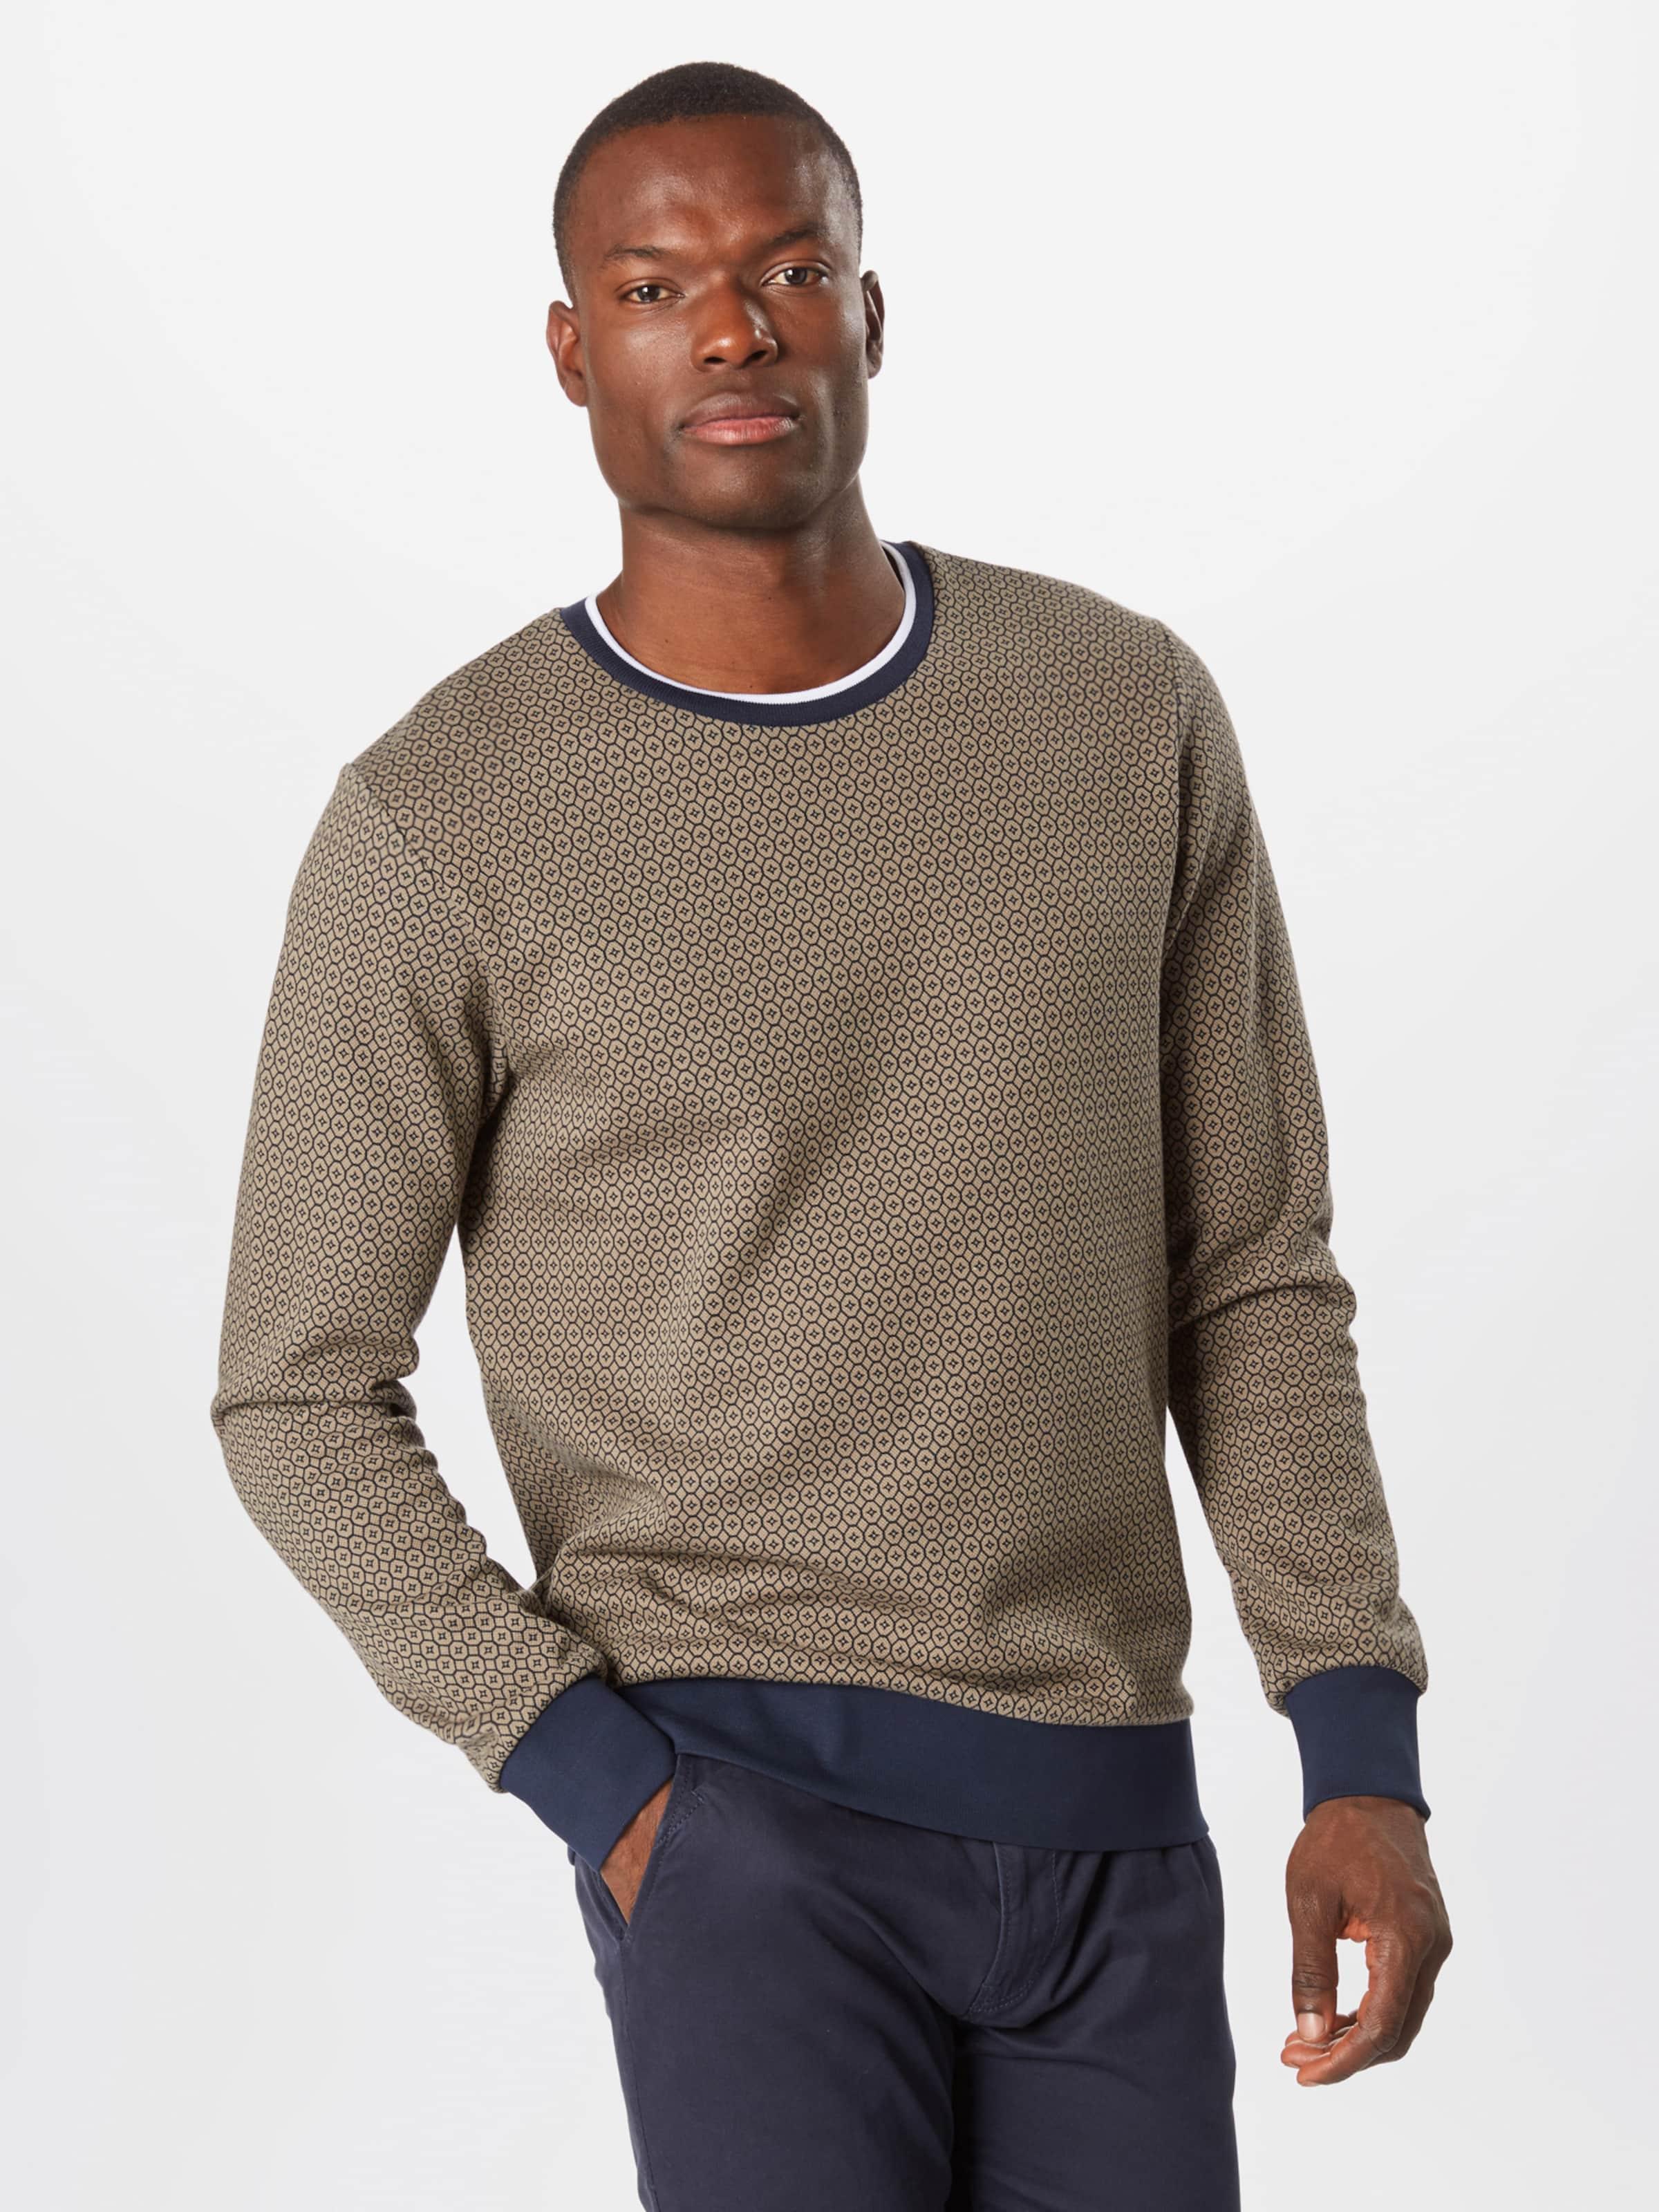 Bleu shirt En MarineTaupe Jones Jackamp; Sweat tCrshQd